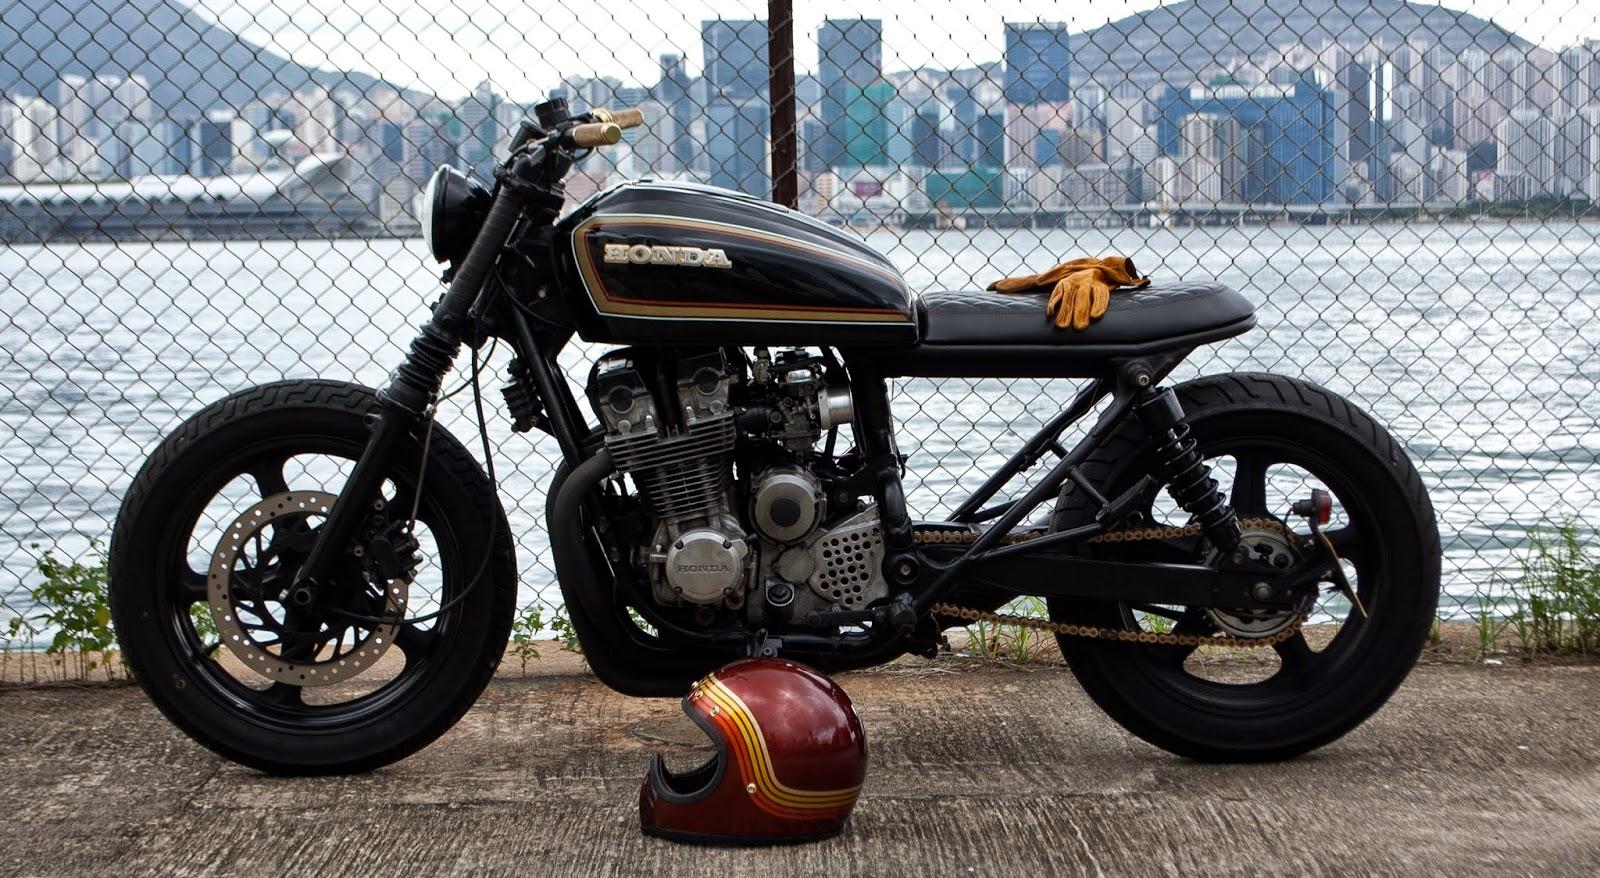 Abandonedpier 1970 Honda Cb 90 Motorcycle